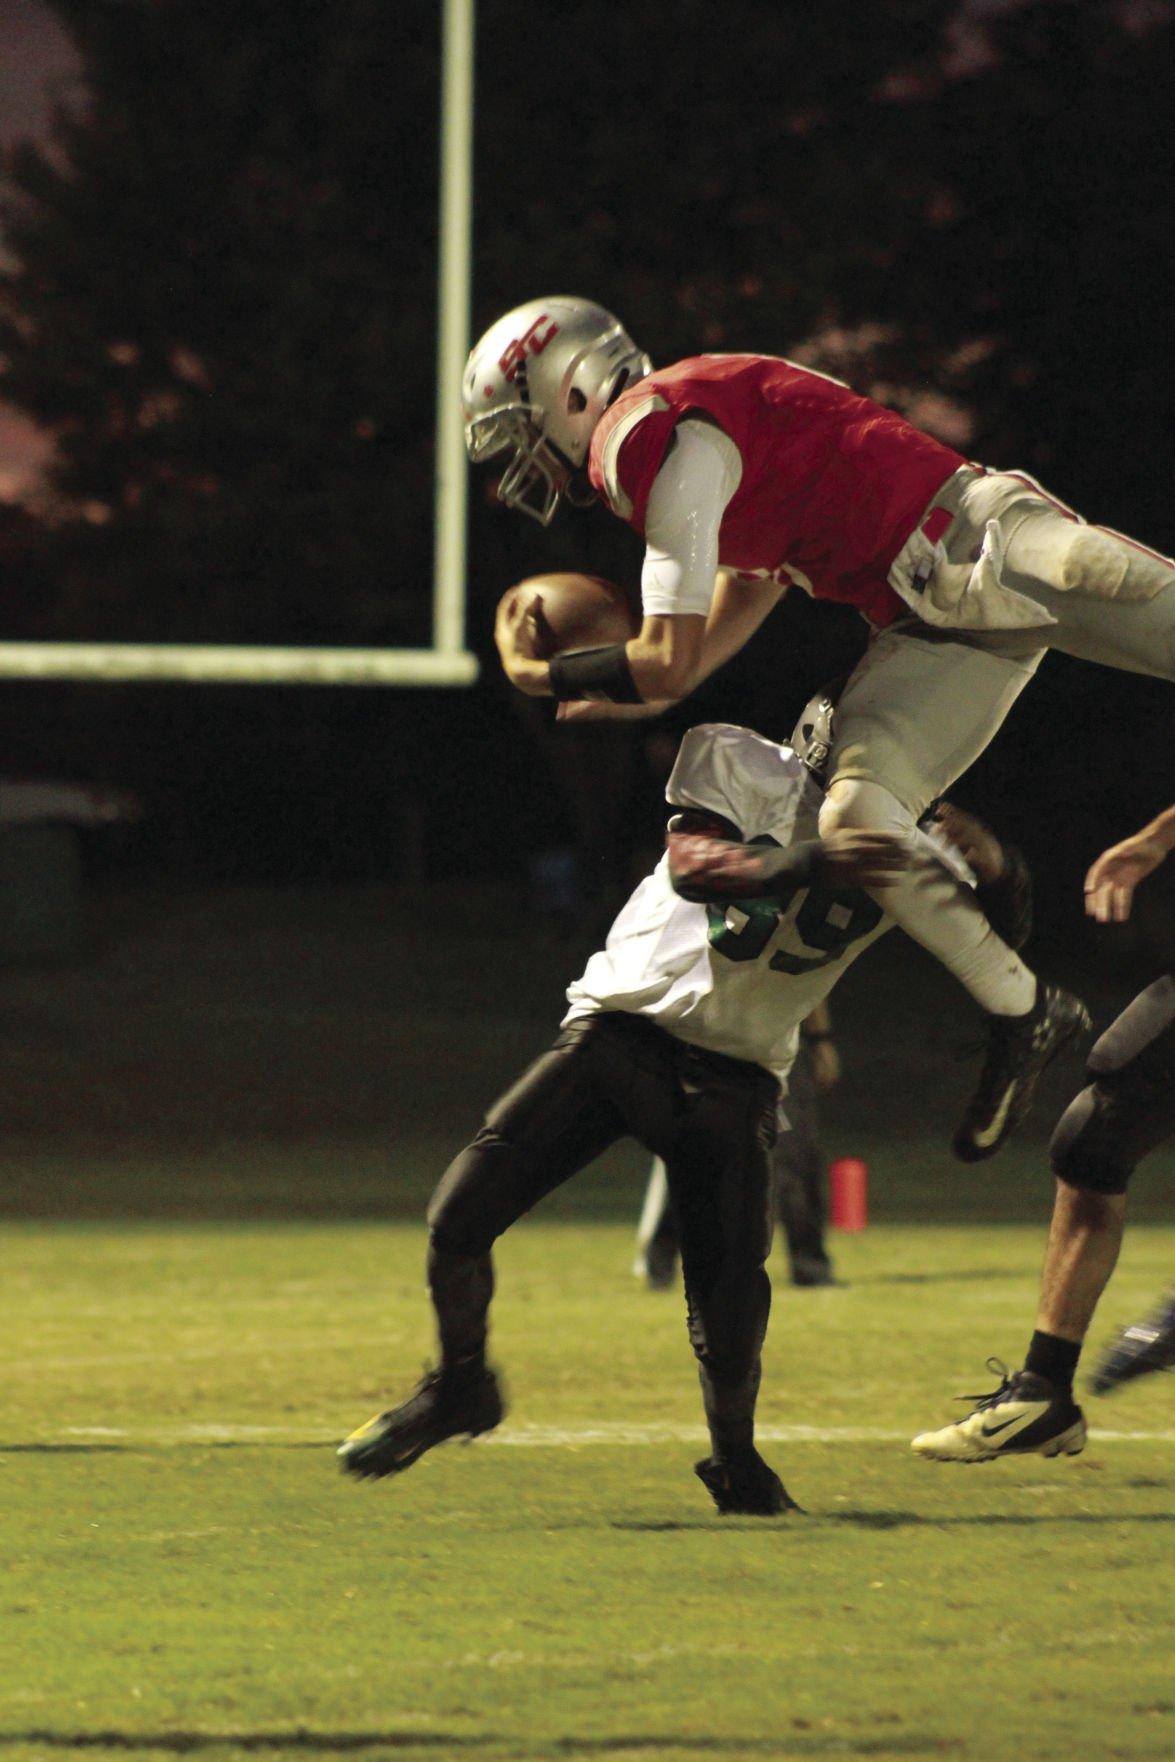 HIGH SCHOOL FOOTBALL: Statesville Christian holds on for 10